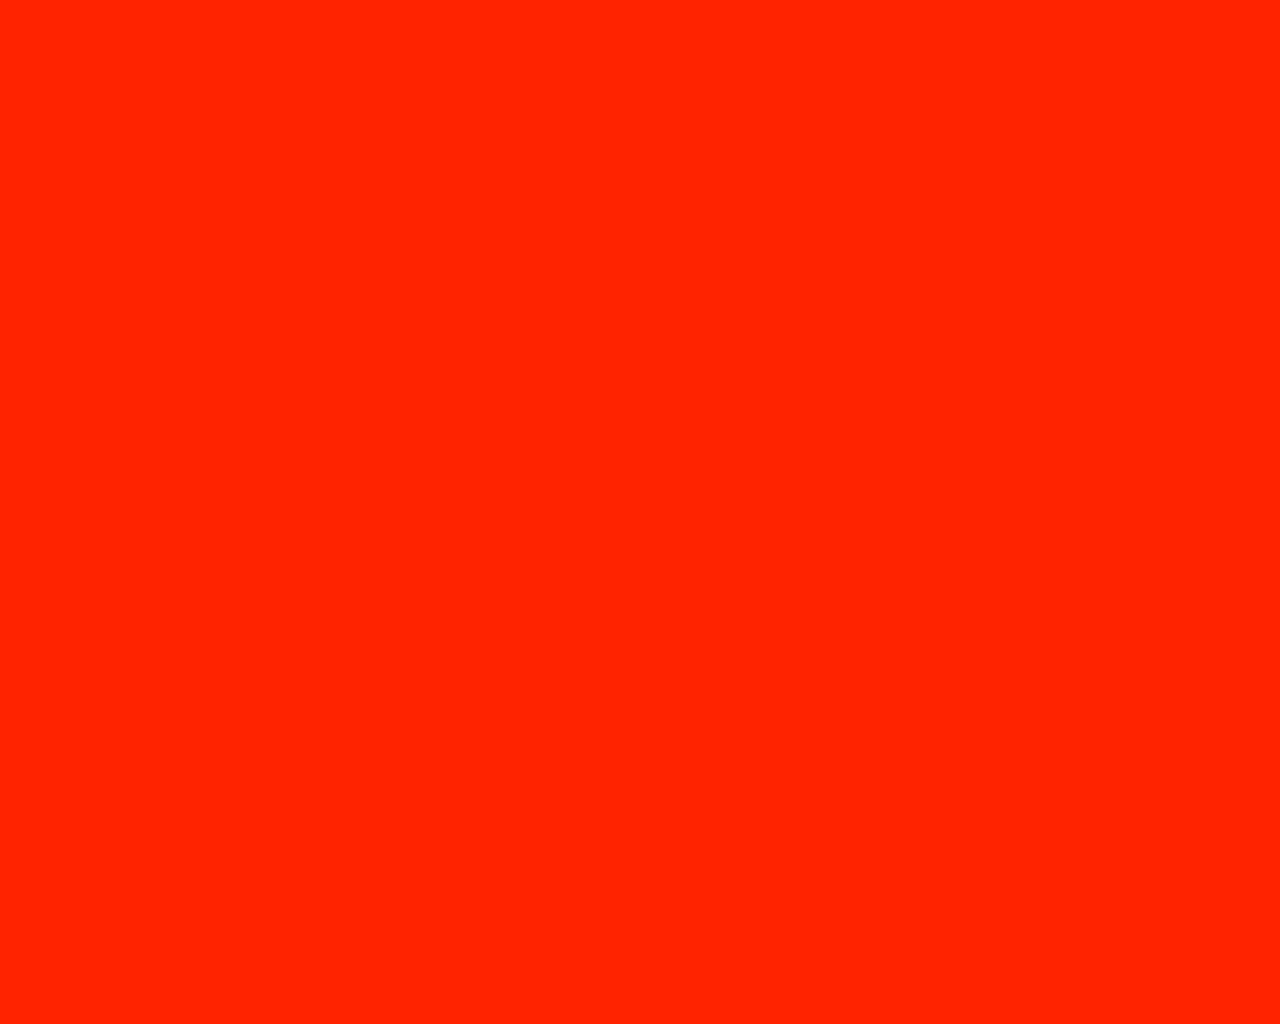 1280x1024 Scarlet Solid Color Background